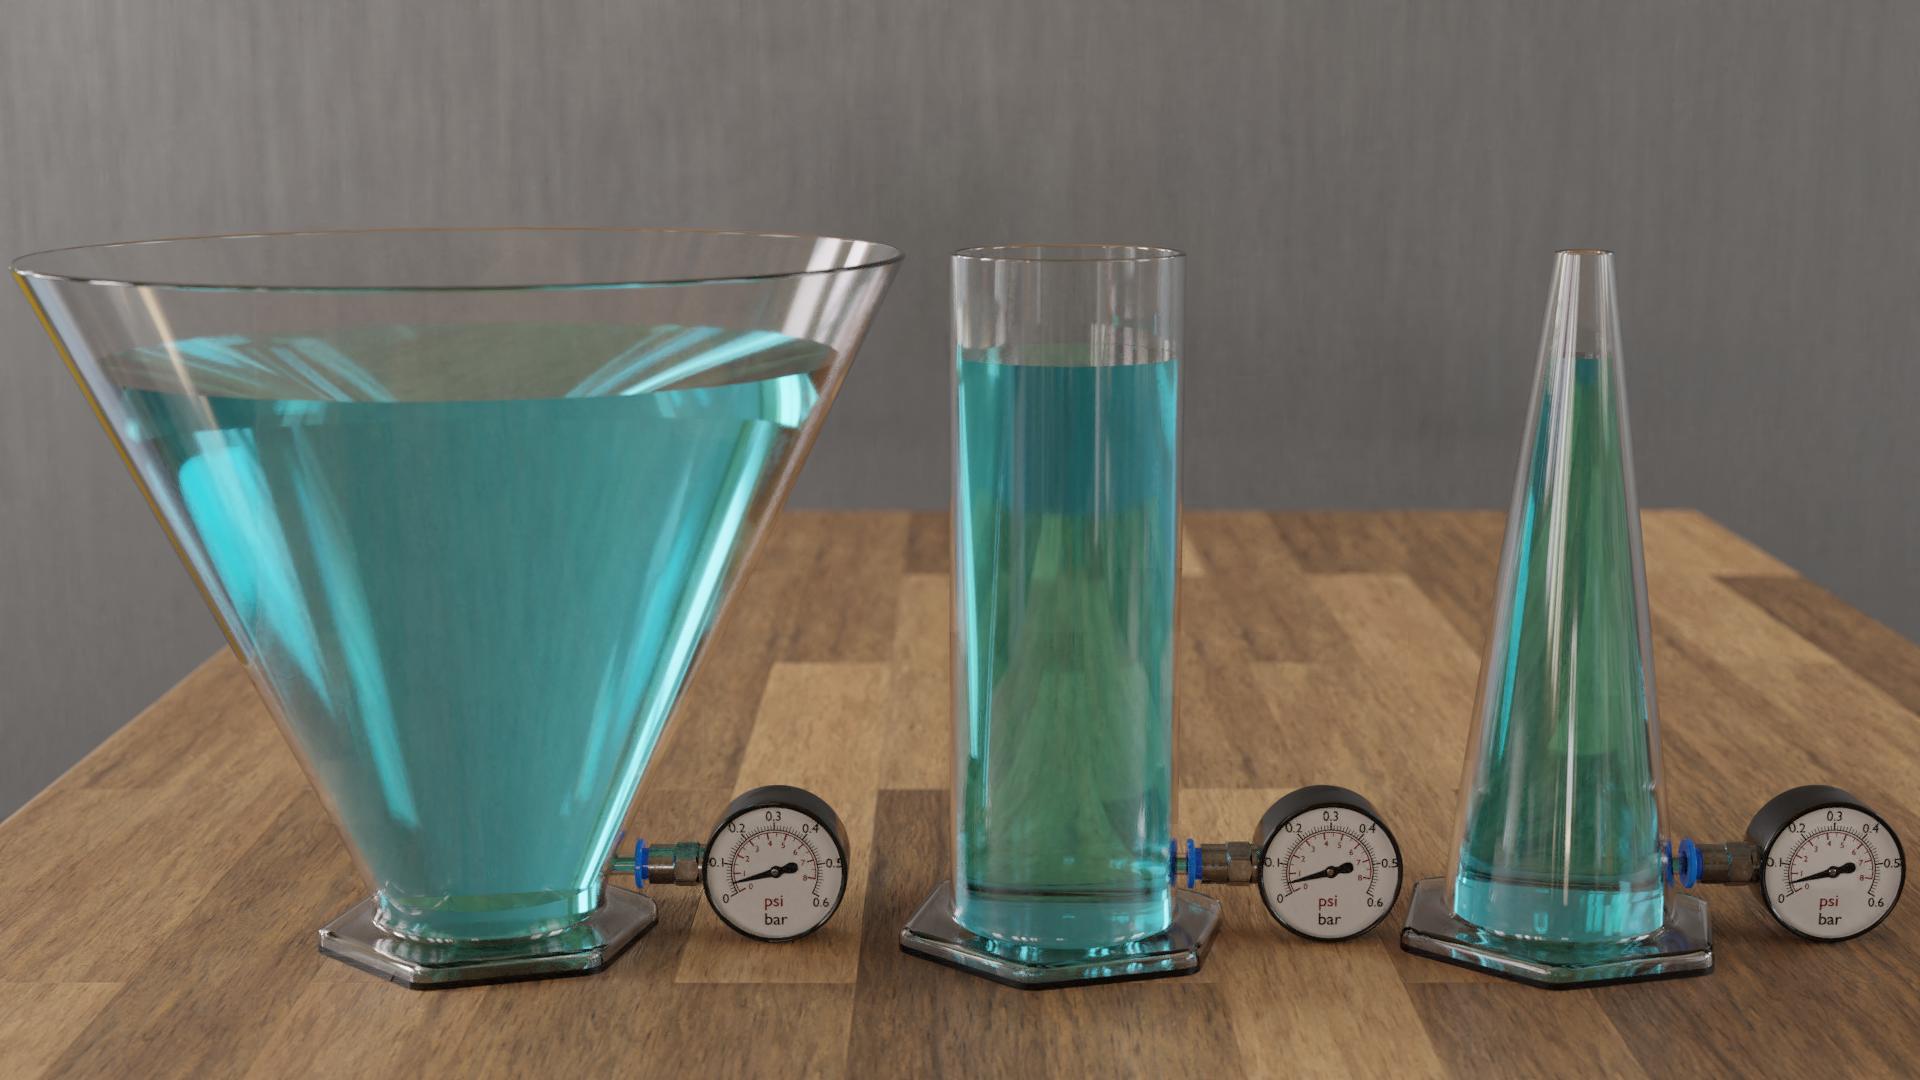 en-liquids-hydrostatic-pressure-water-vessel-shape.png